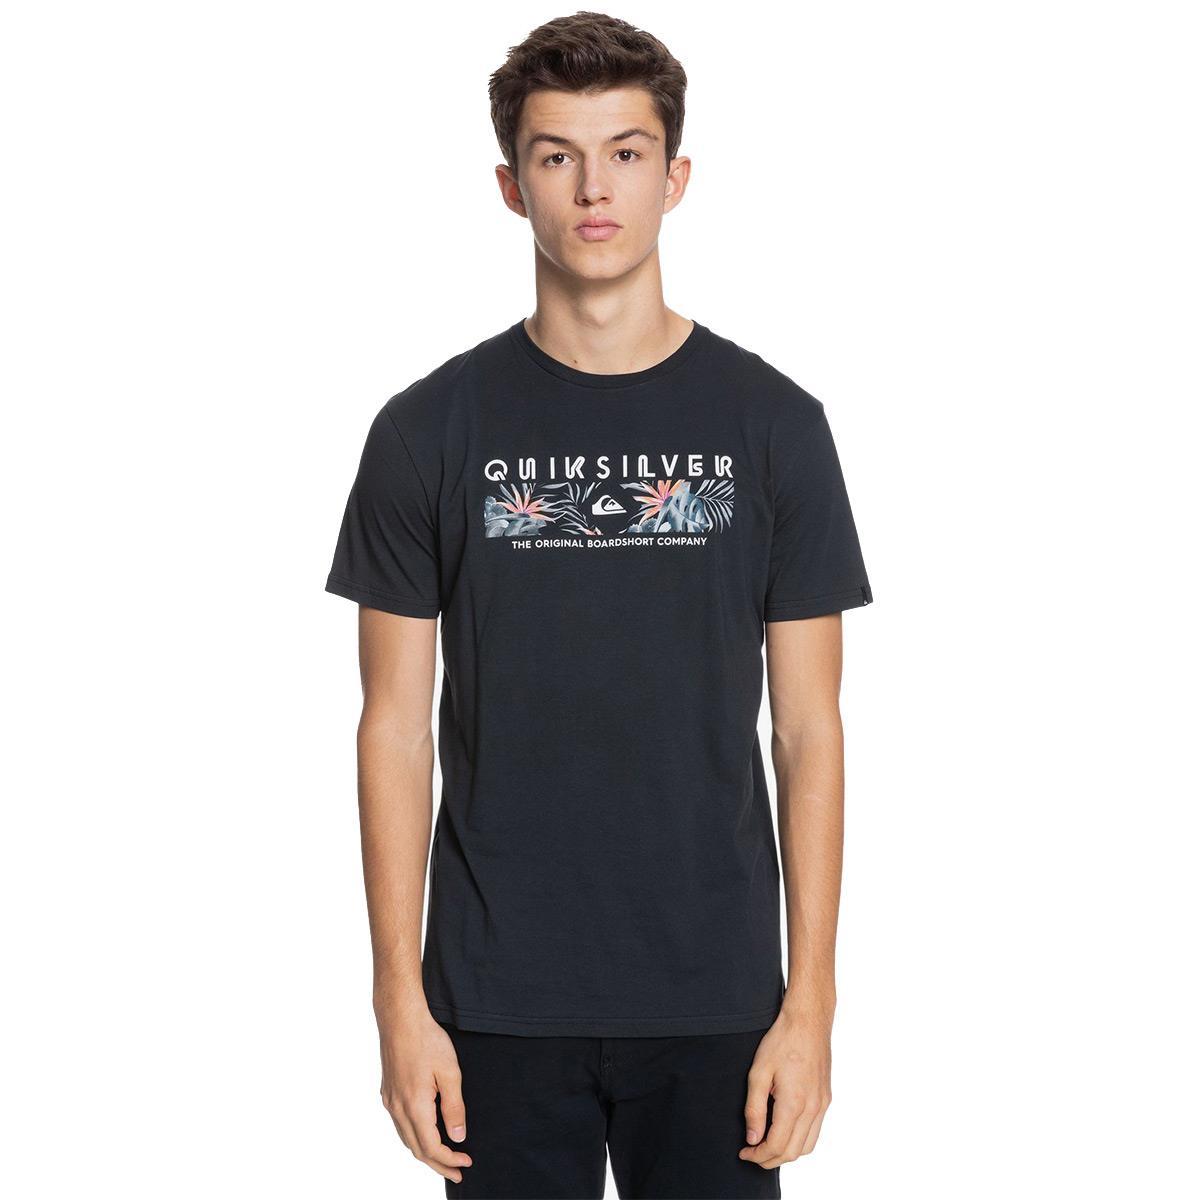 Quiksilver Dıstant Shores SS T-Shirt EQYZT06323